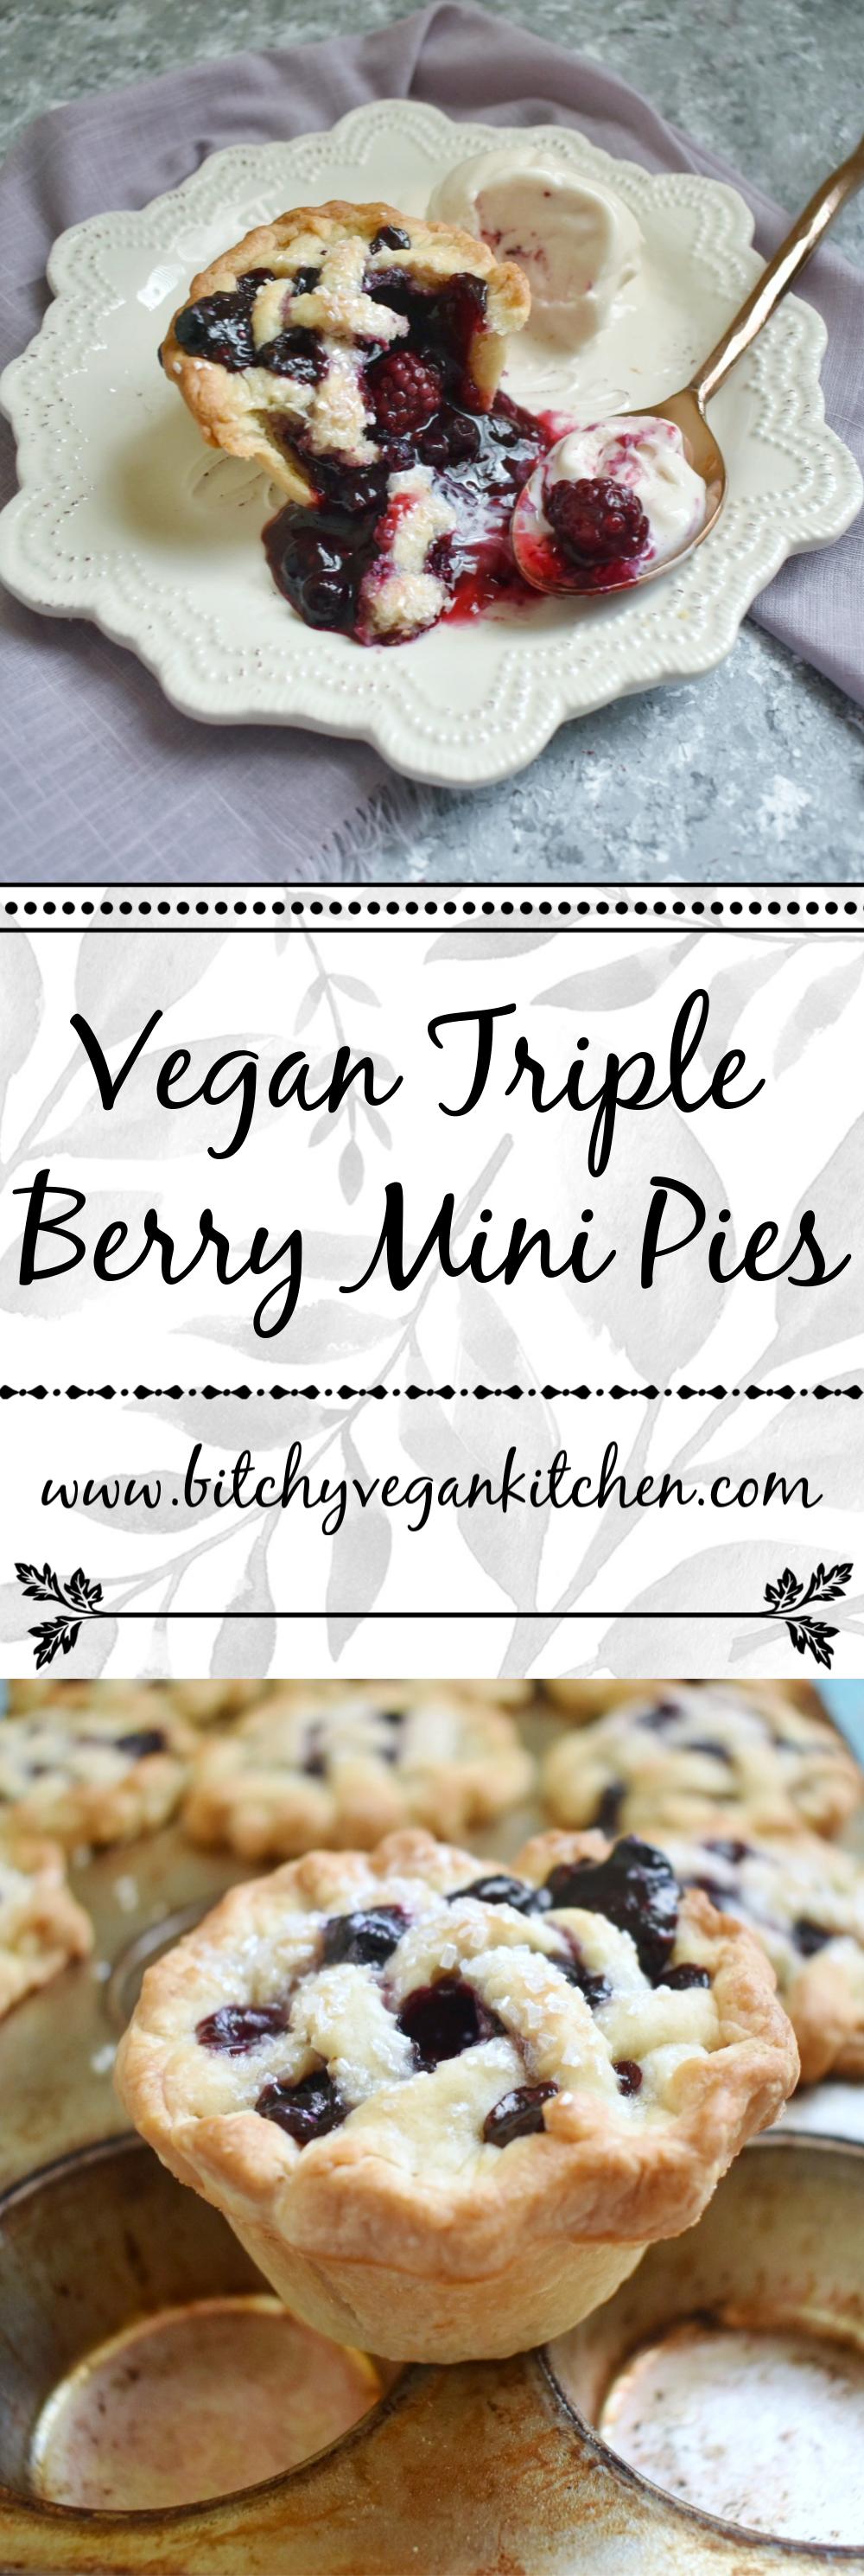 Vegan Triple Berry Mini Pies - The Bitchy Baker